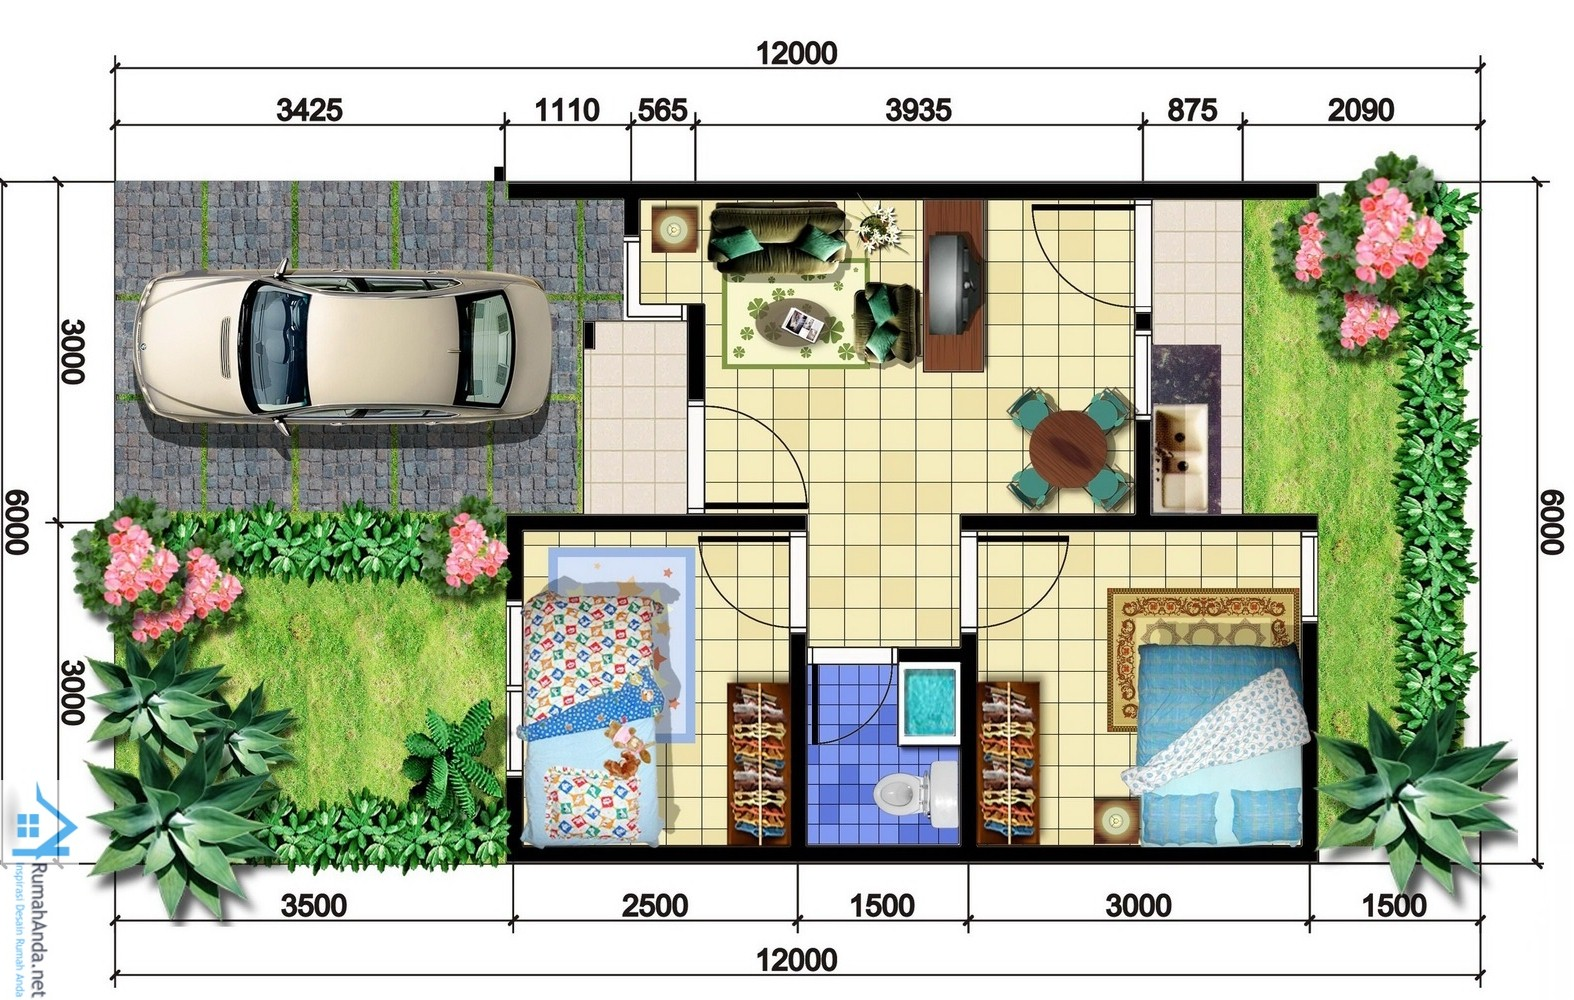 69 Desain Rumah Minimalis Ukuran 6x12 Terbaru Kumpulan Denah 1